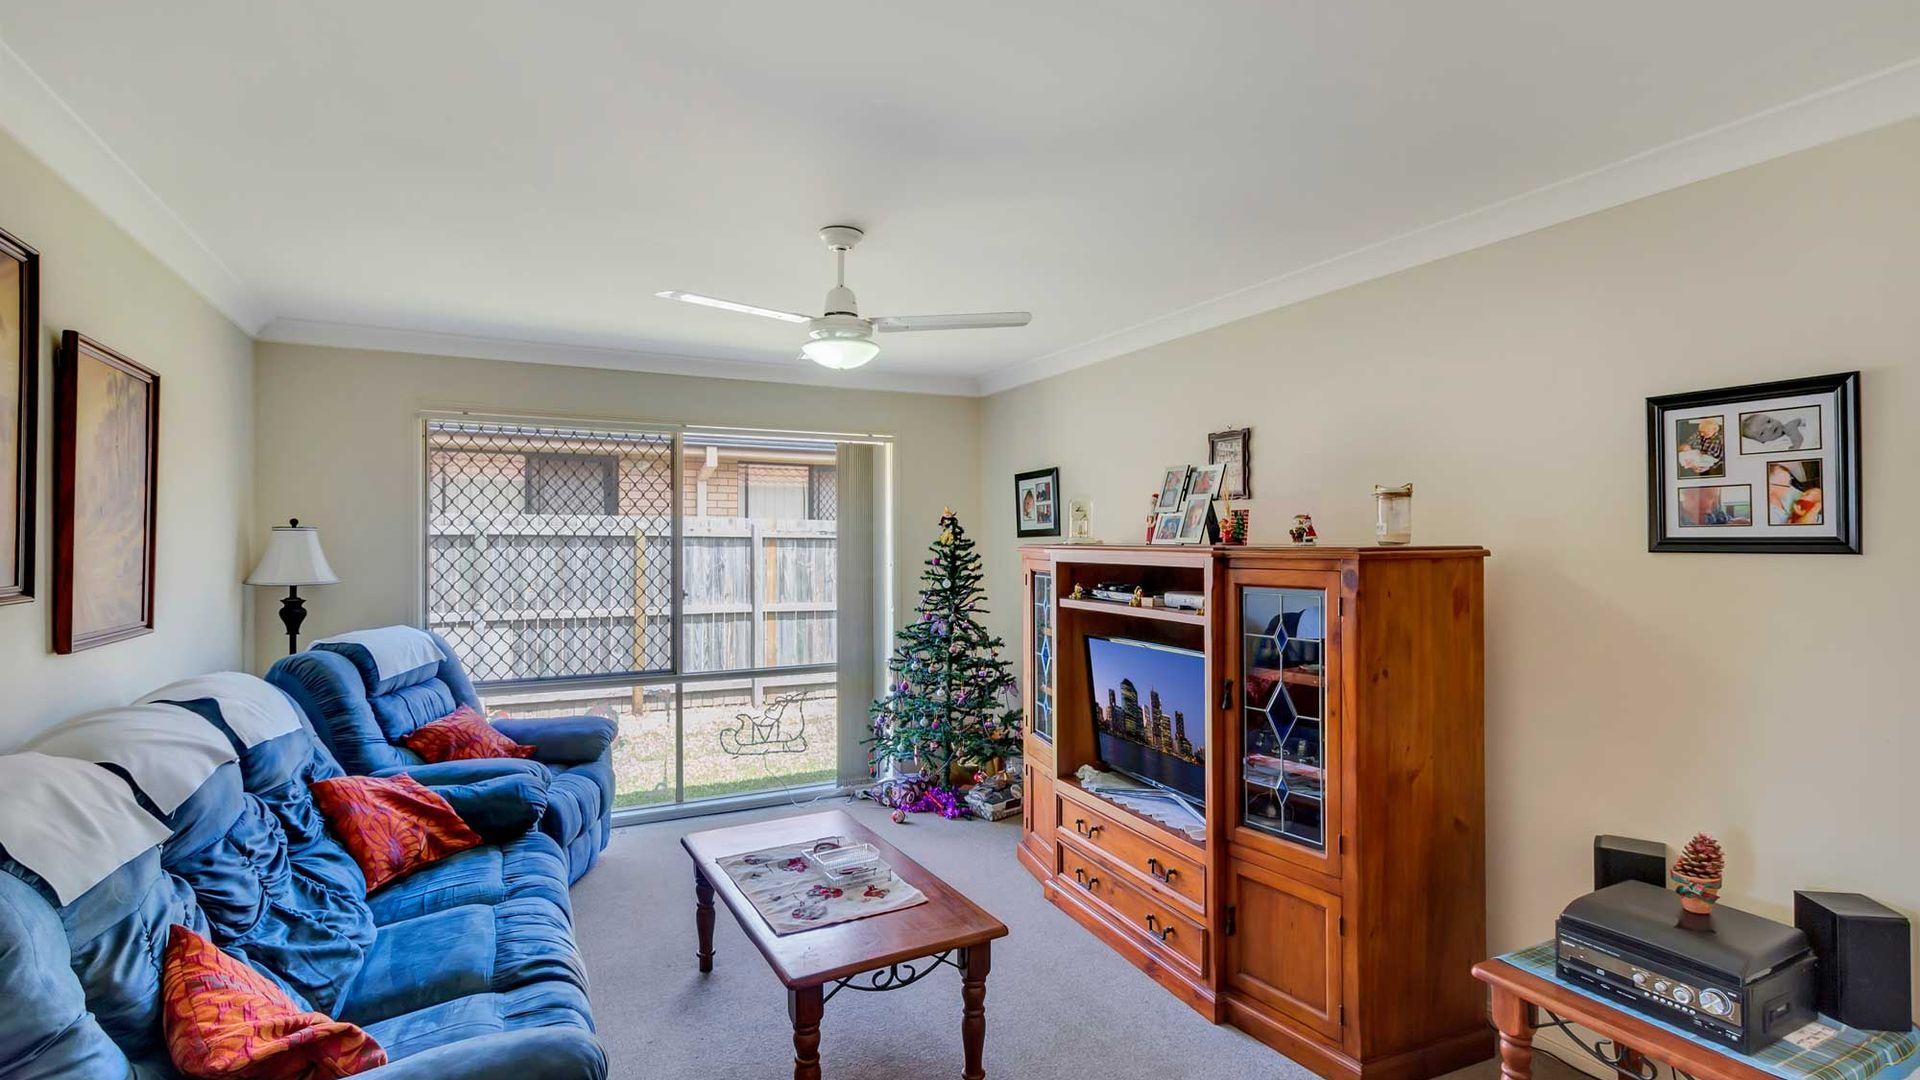 174 Macquarie Way, Drewvale QLD 4116, Image 1